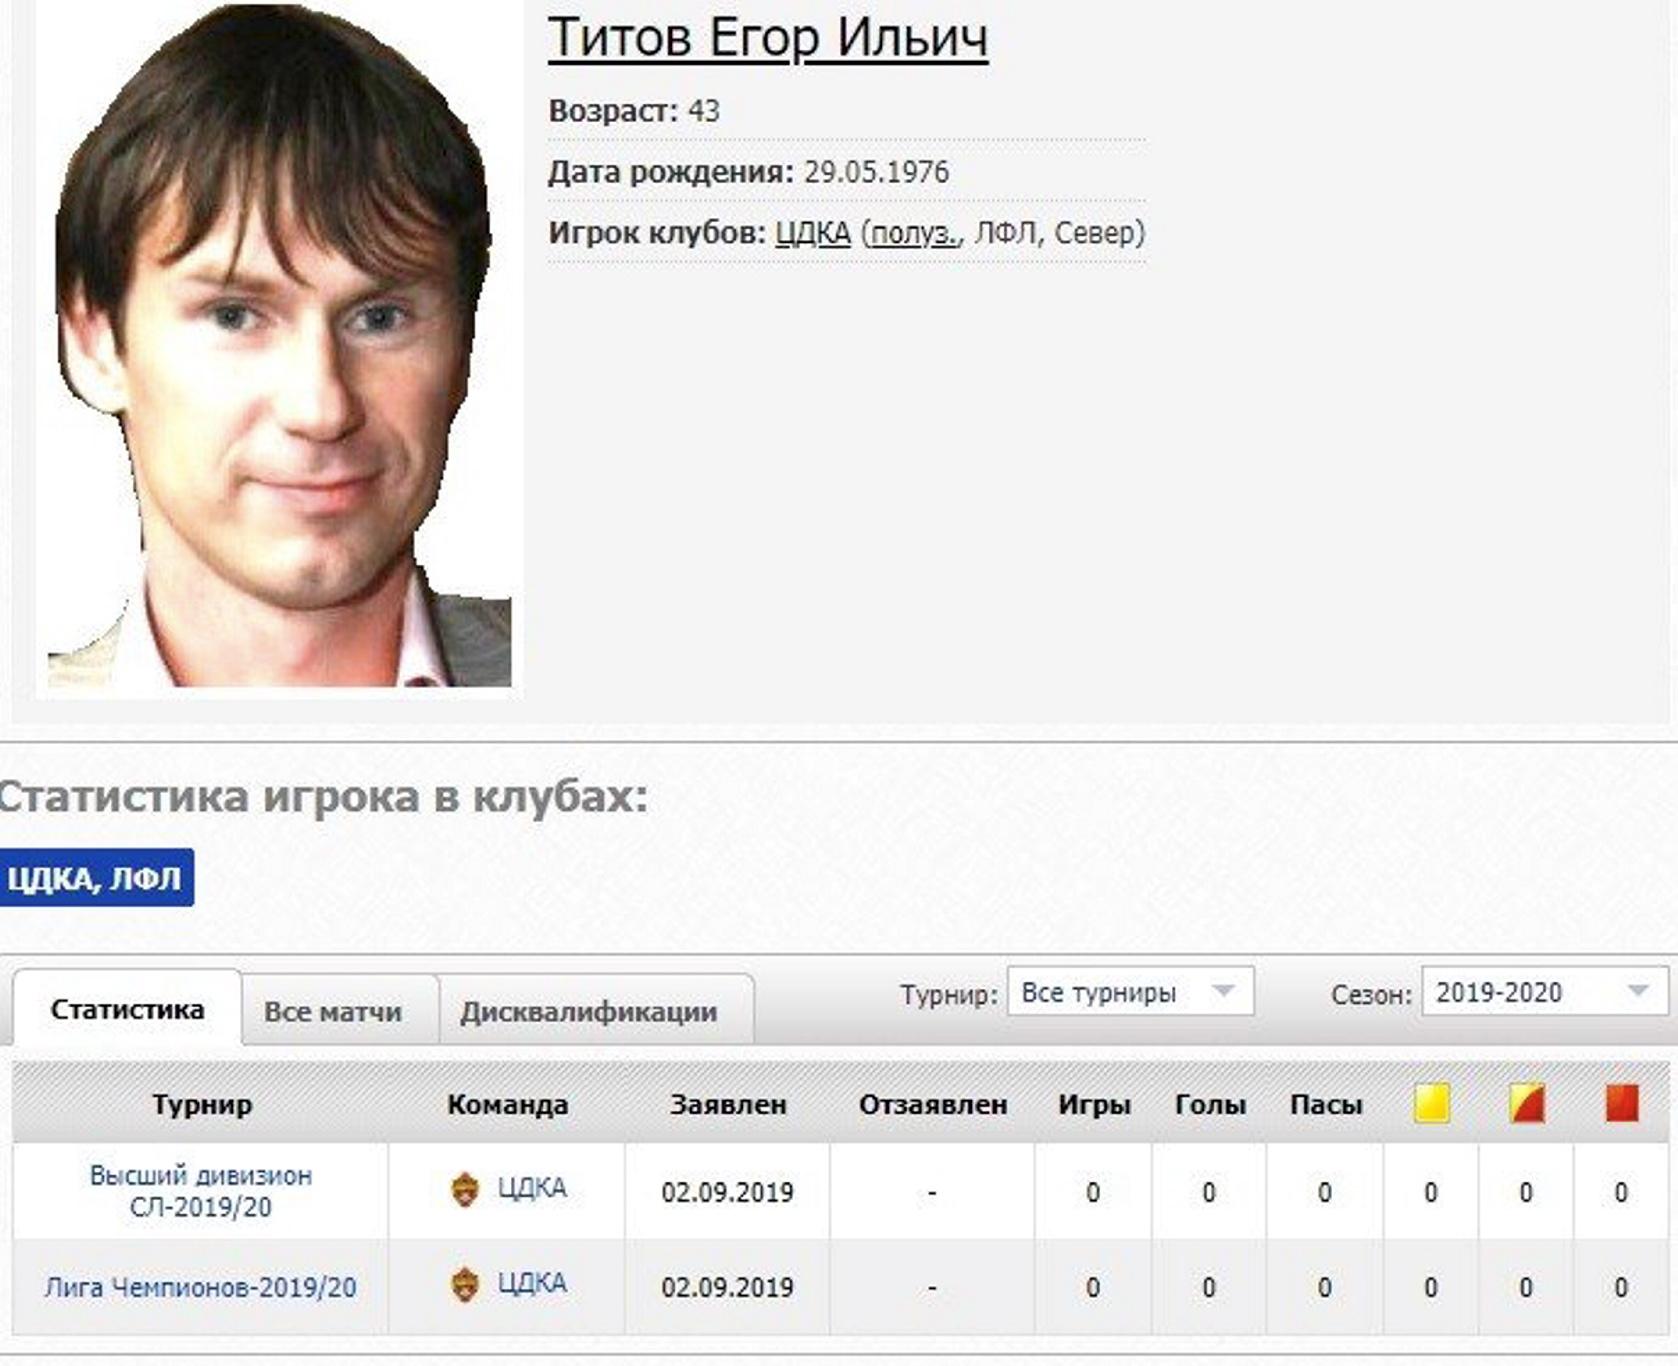 Андрей Каряка: Титова в ЦДКА позвал я